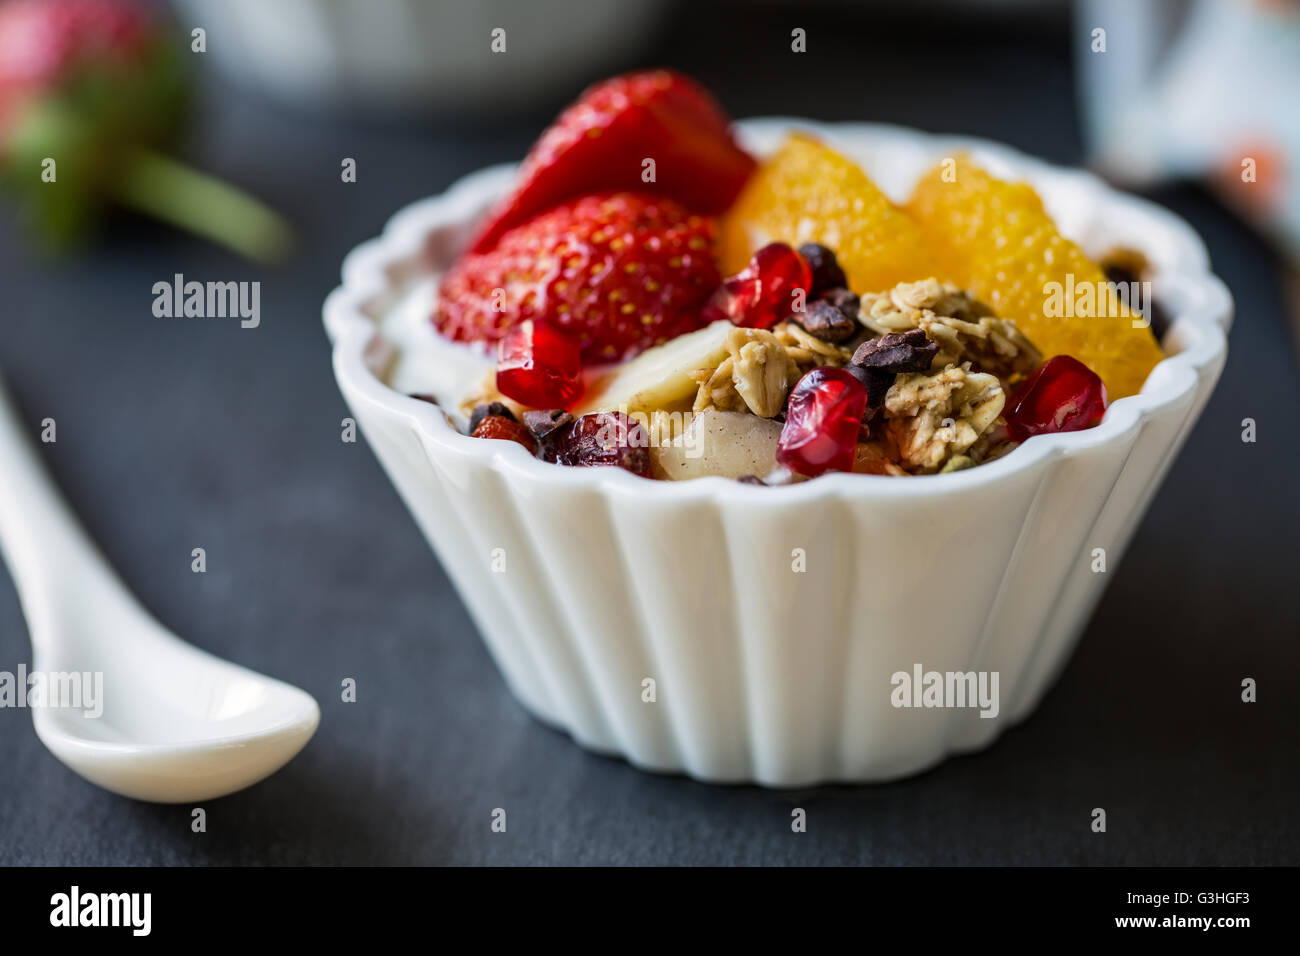 Barres granola avec orange, fraise, Cacao nibs et Grenade sur le yogourt Photo Stock